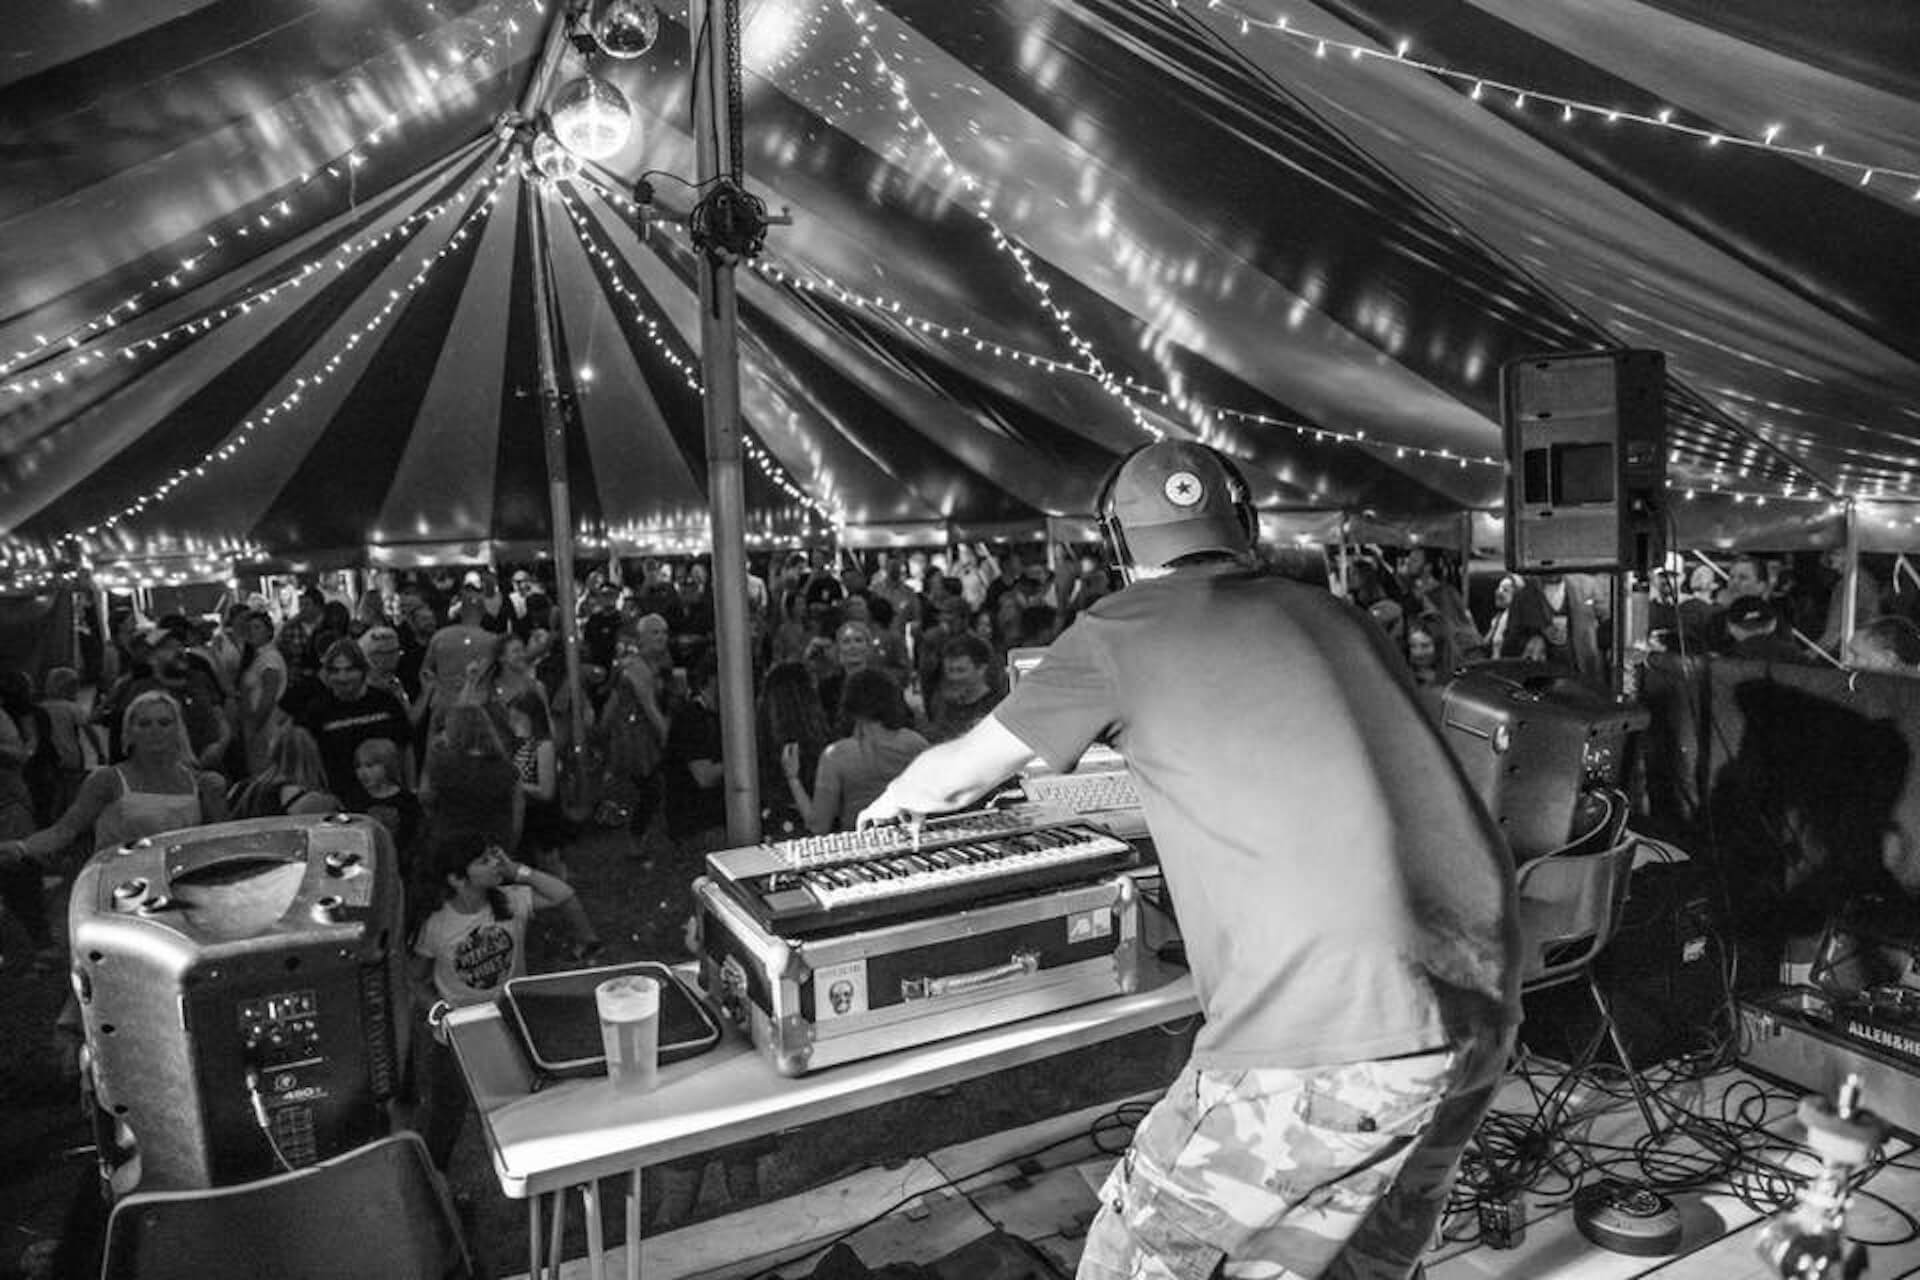 Dance tent at Devon festival